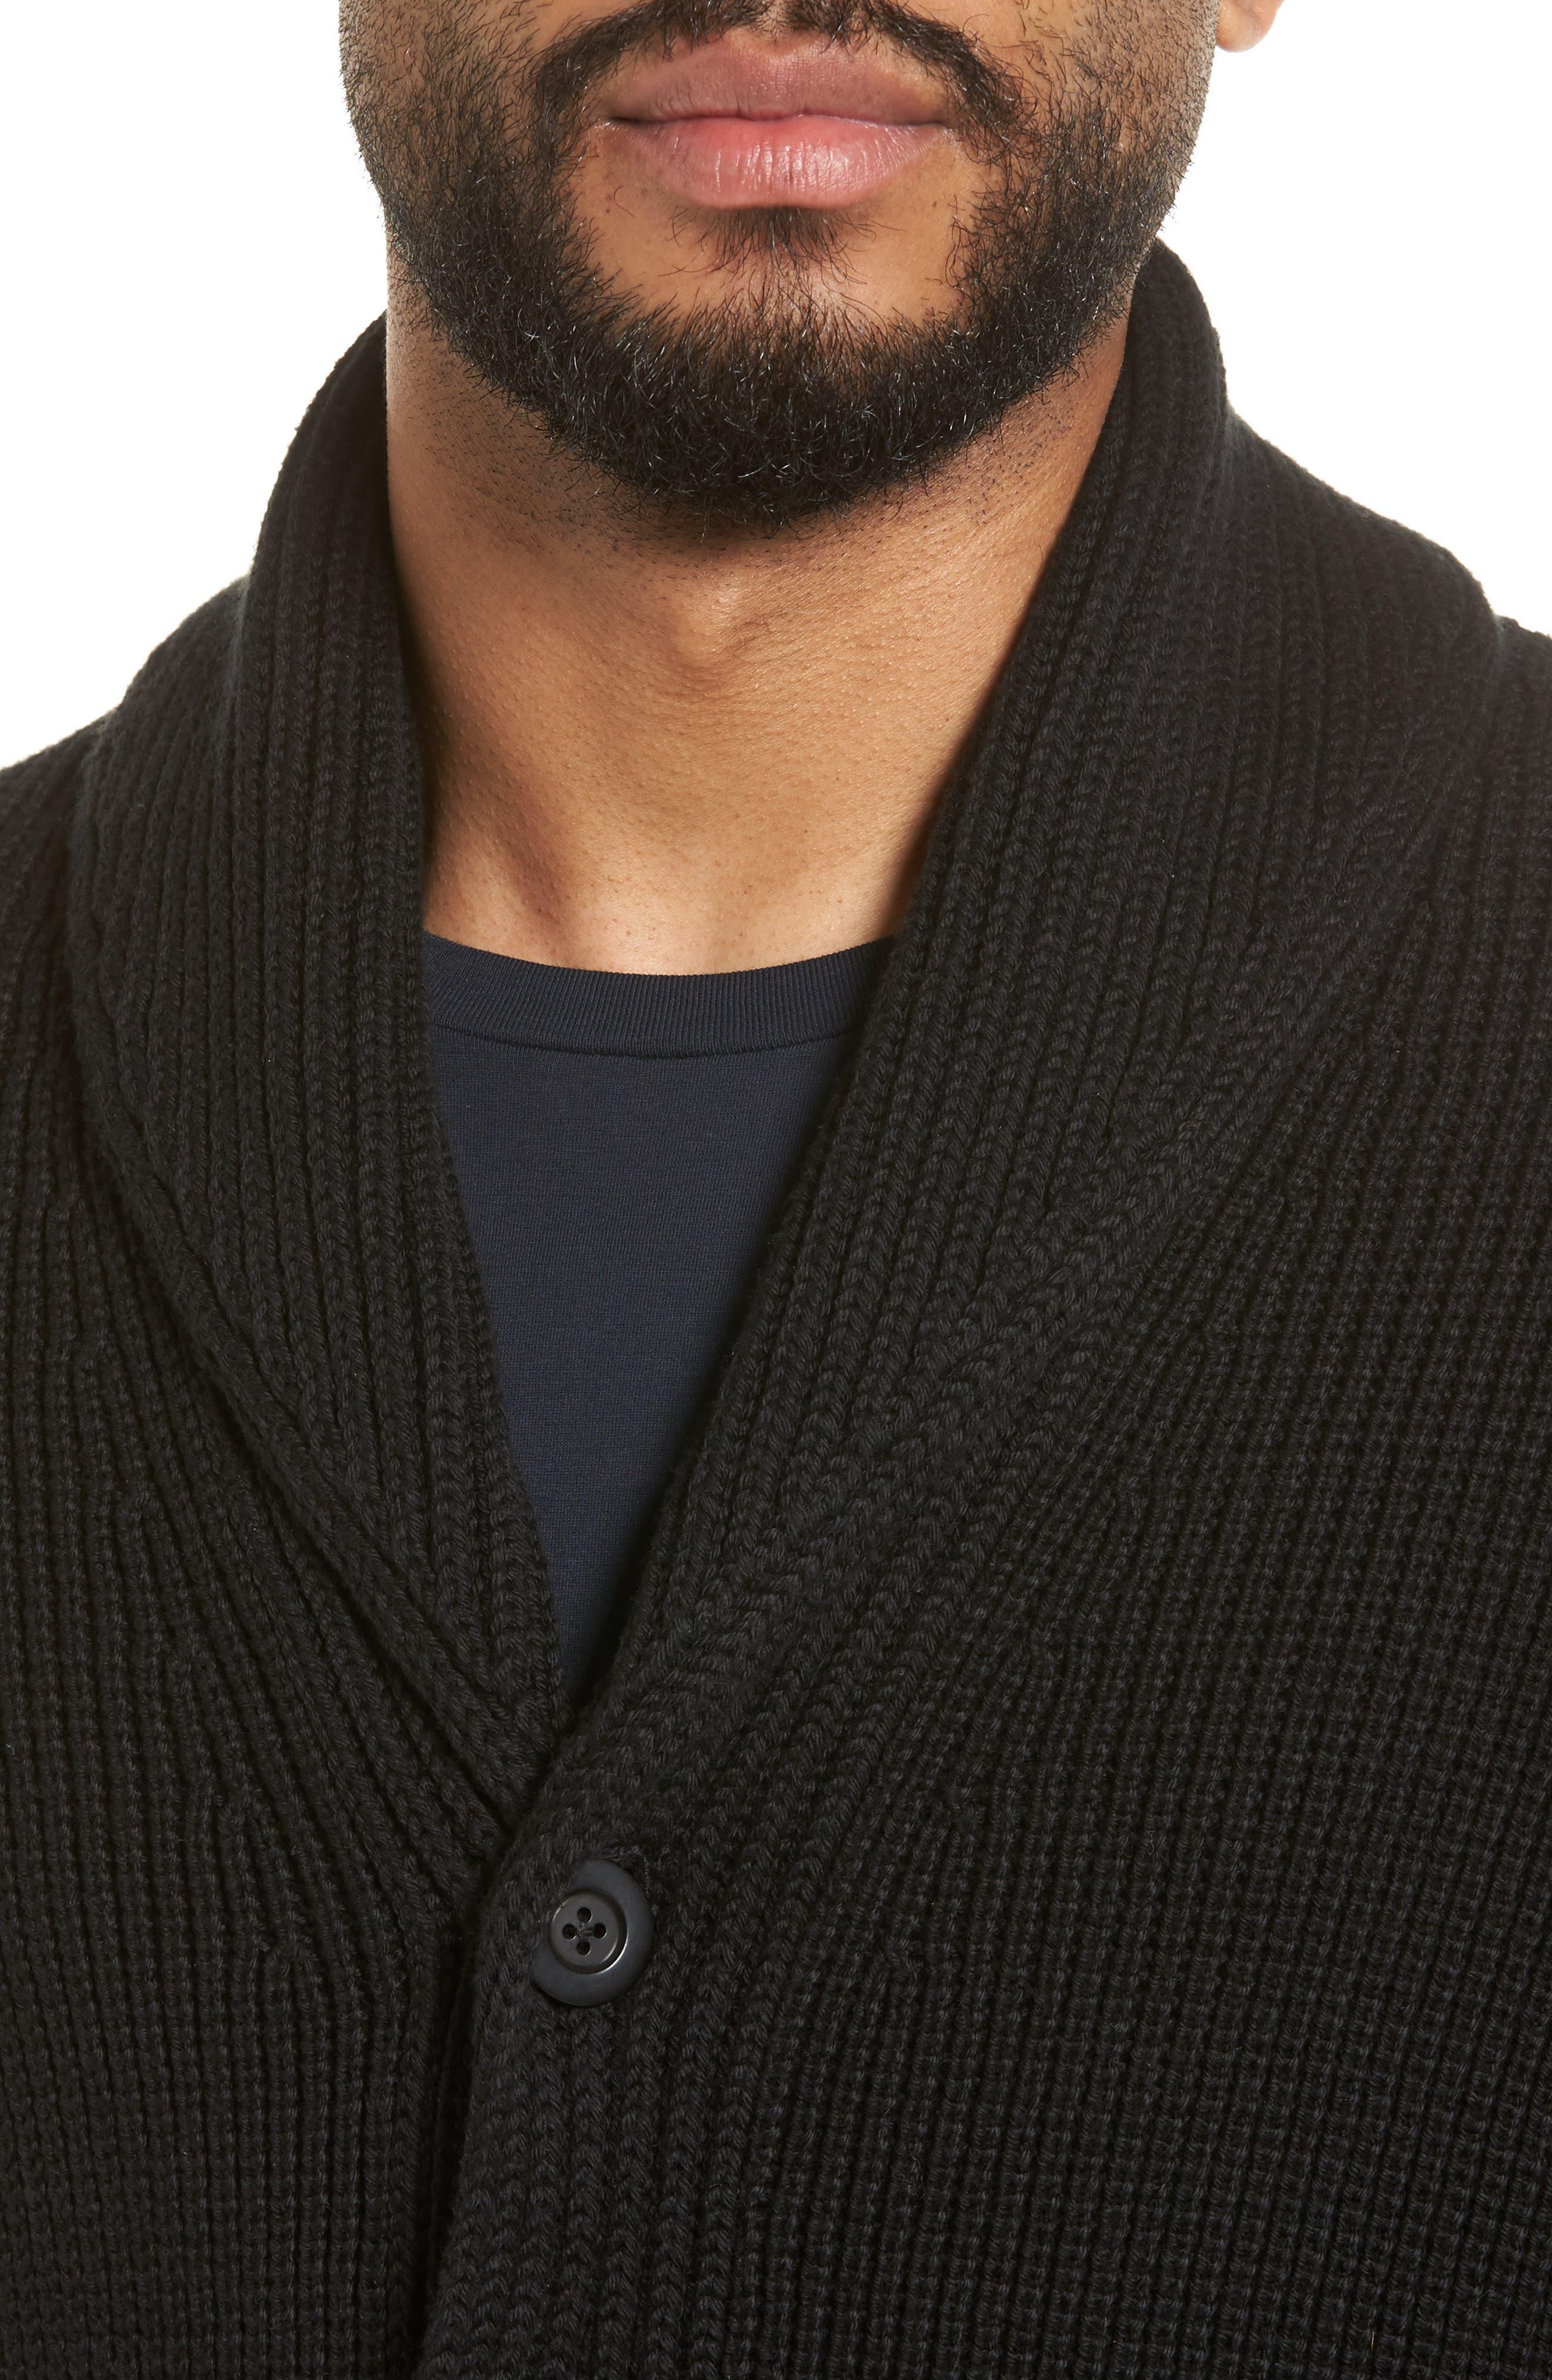 Shawl Collar Cardigan,                             Alternate thumbnail 4, color,                             Black